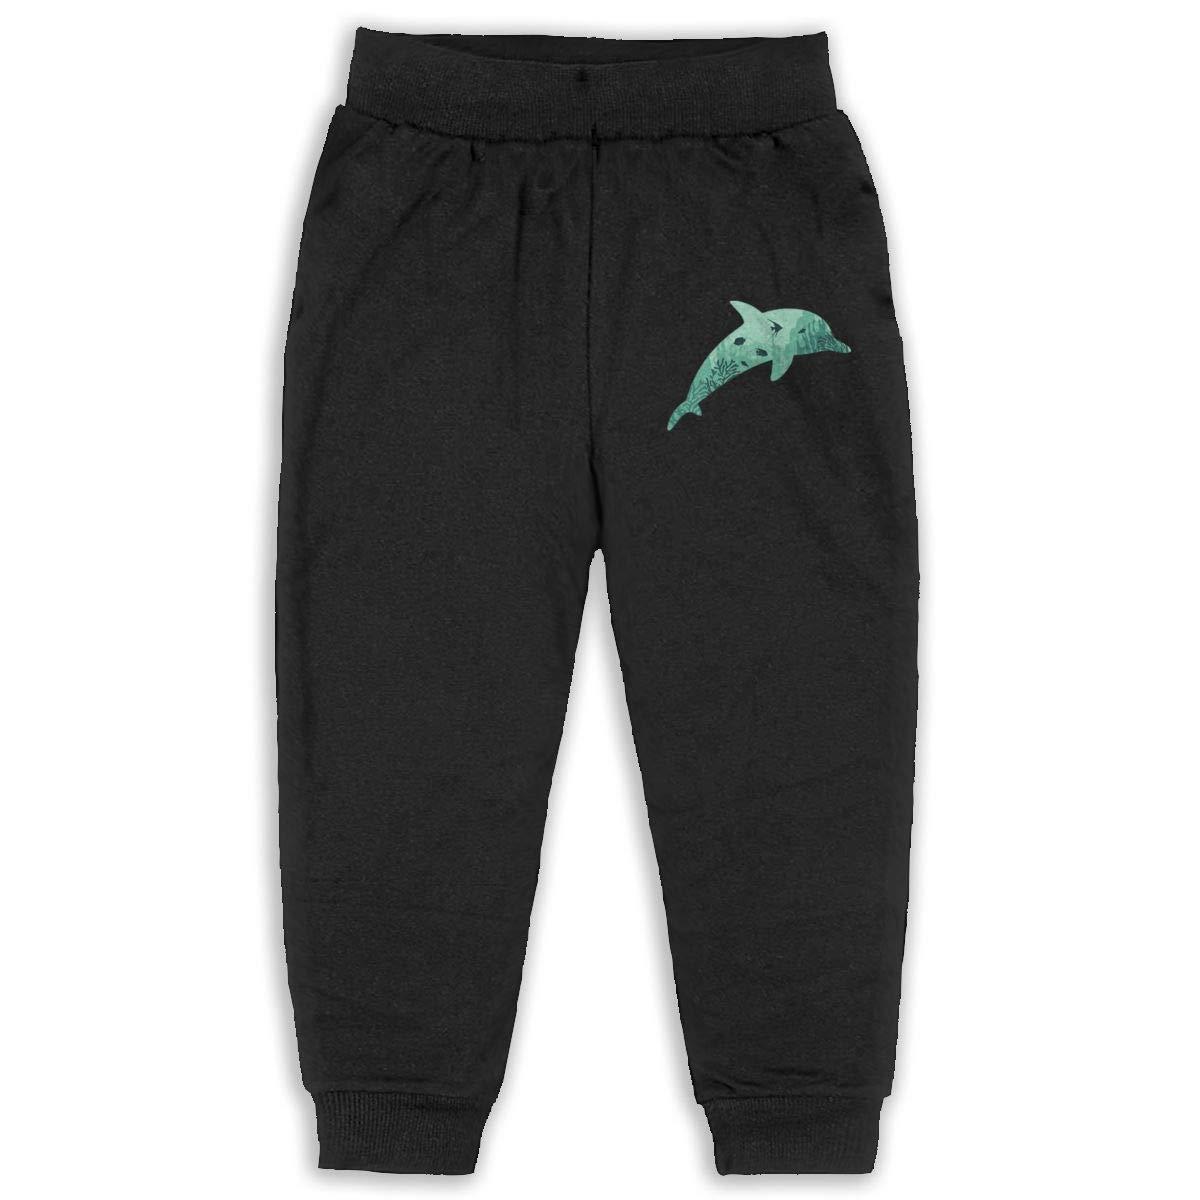 Dolphin Coral Silhouette Children Cartoon Cotton Sweatpants Sport Jogger Elastic Pants